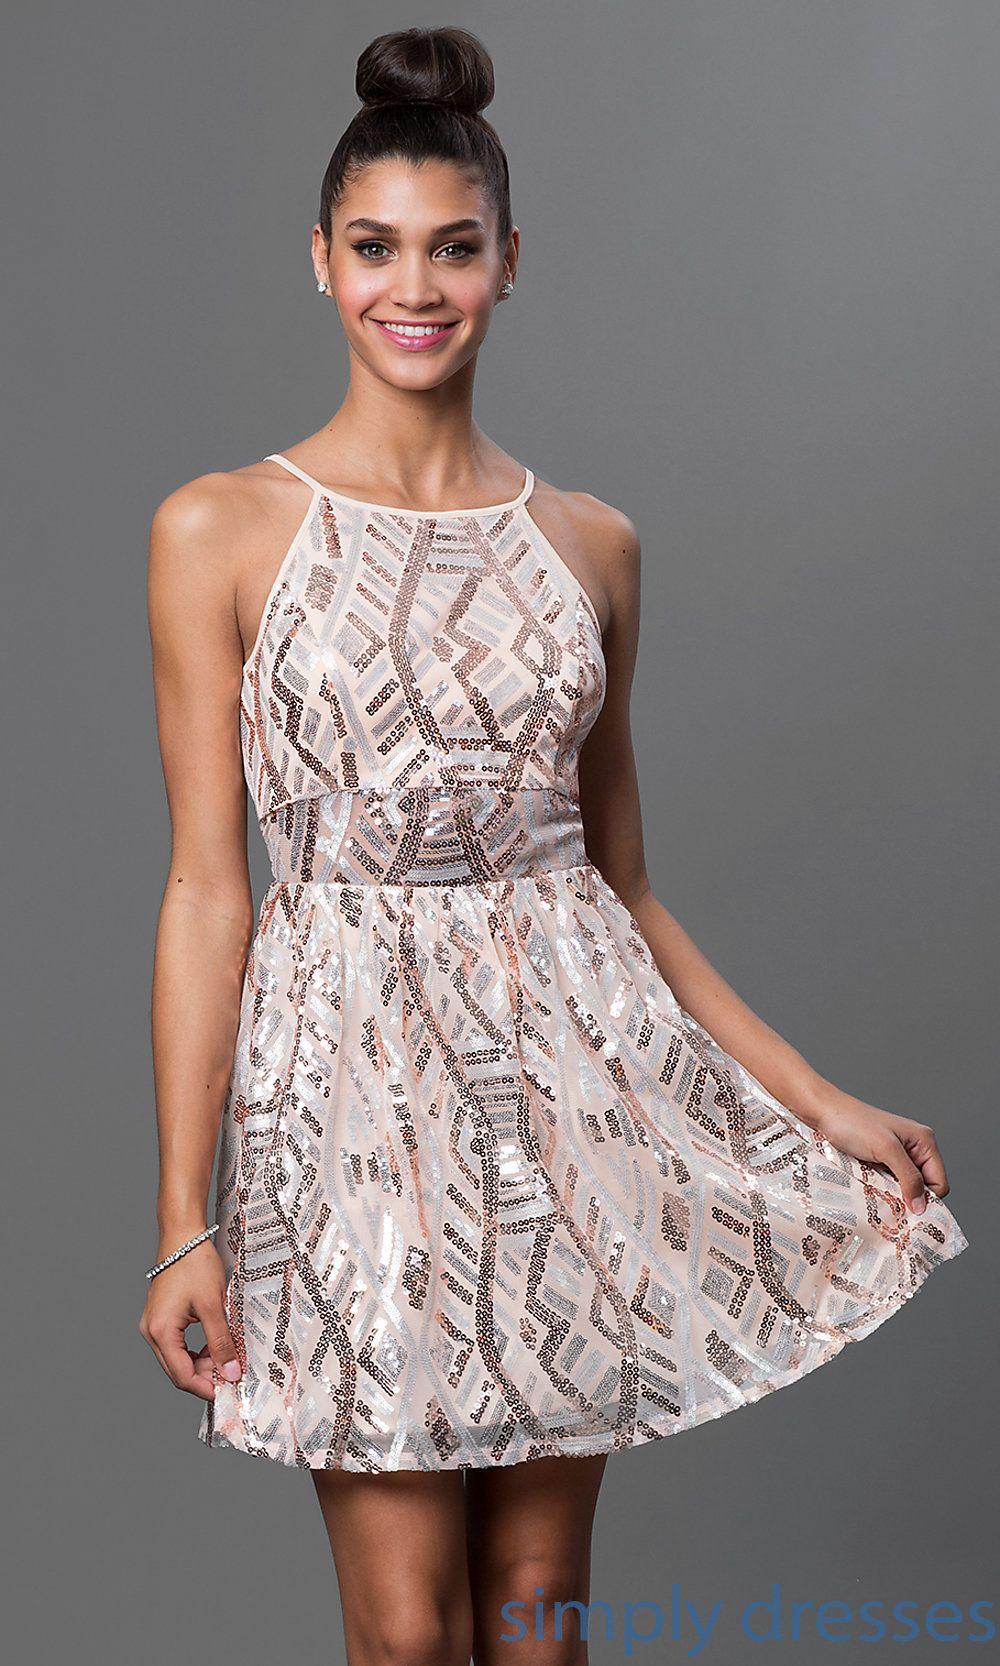 Shop short sleeveless graduation dresses or short dresses at simply